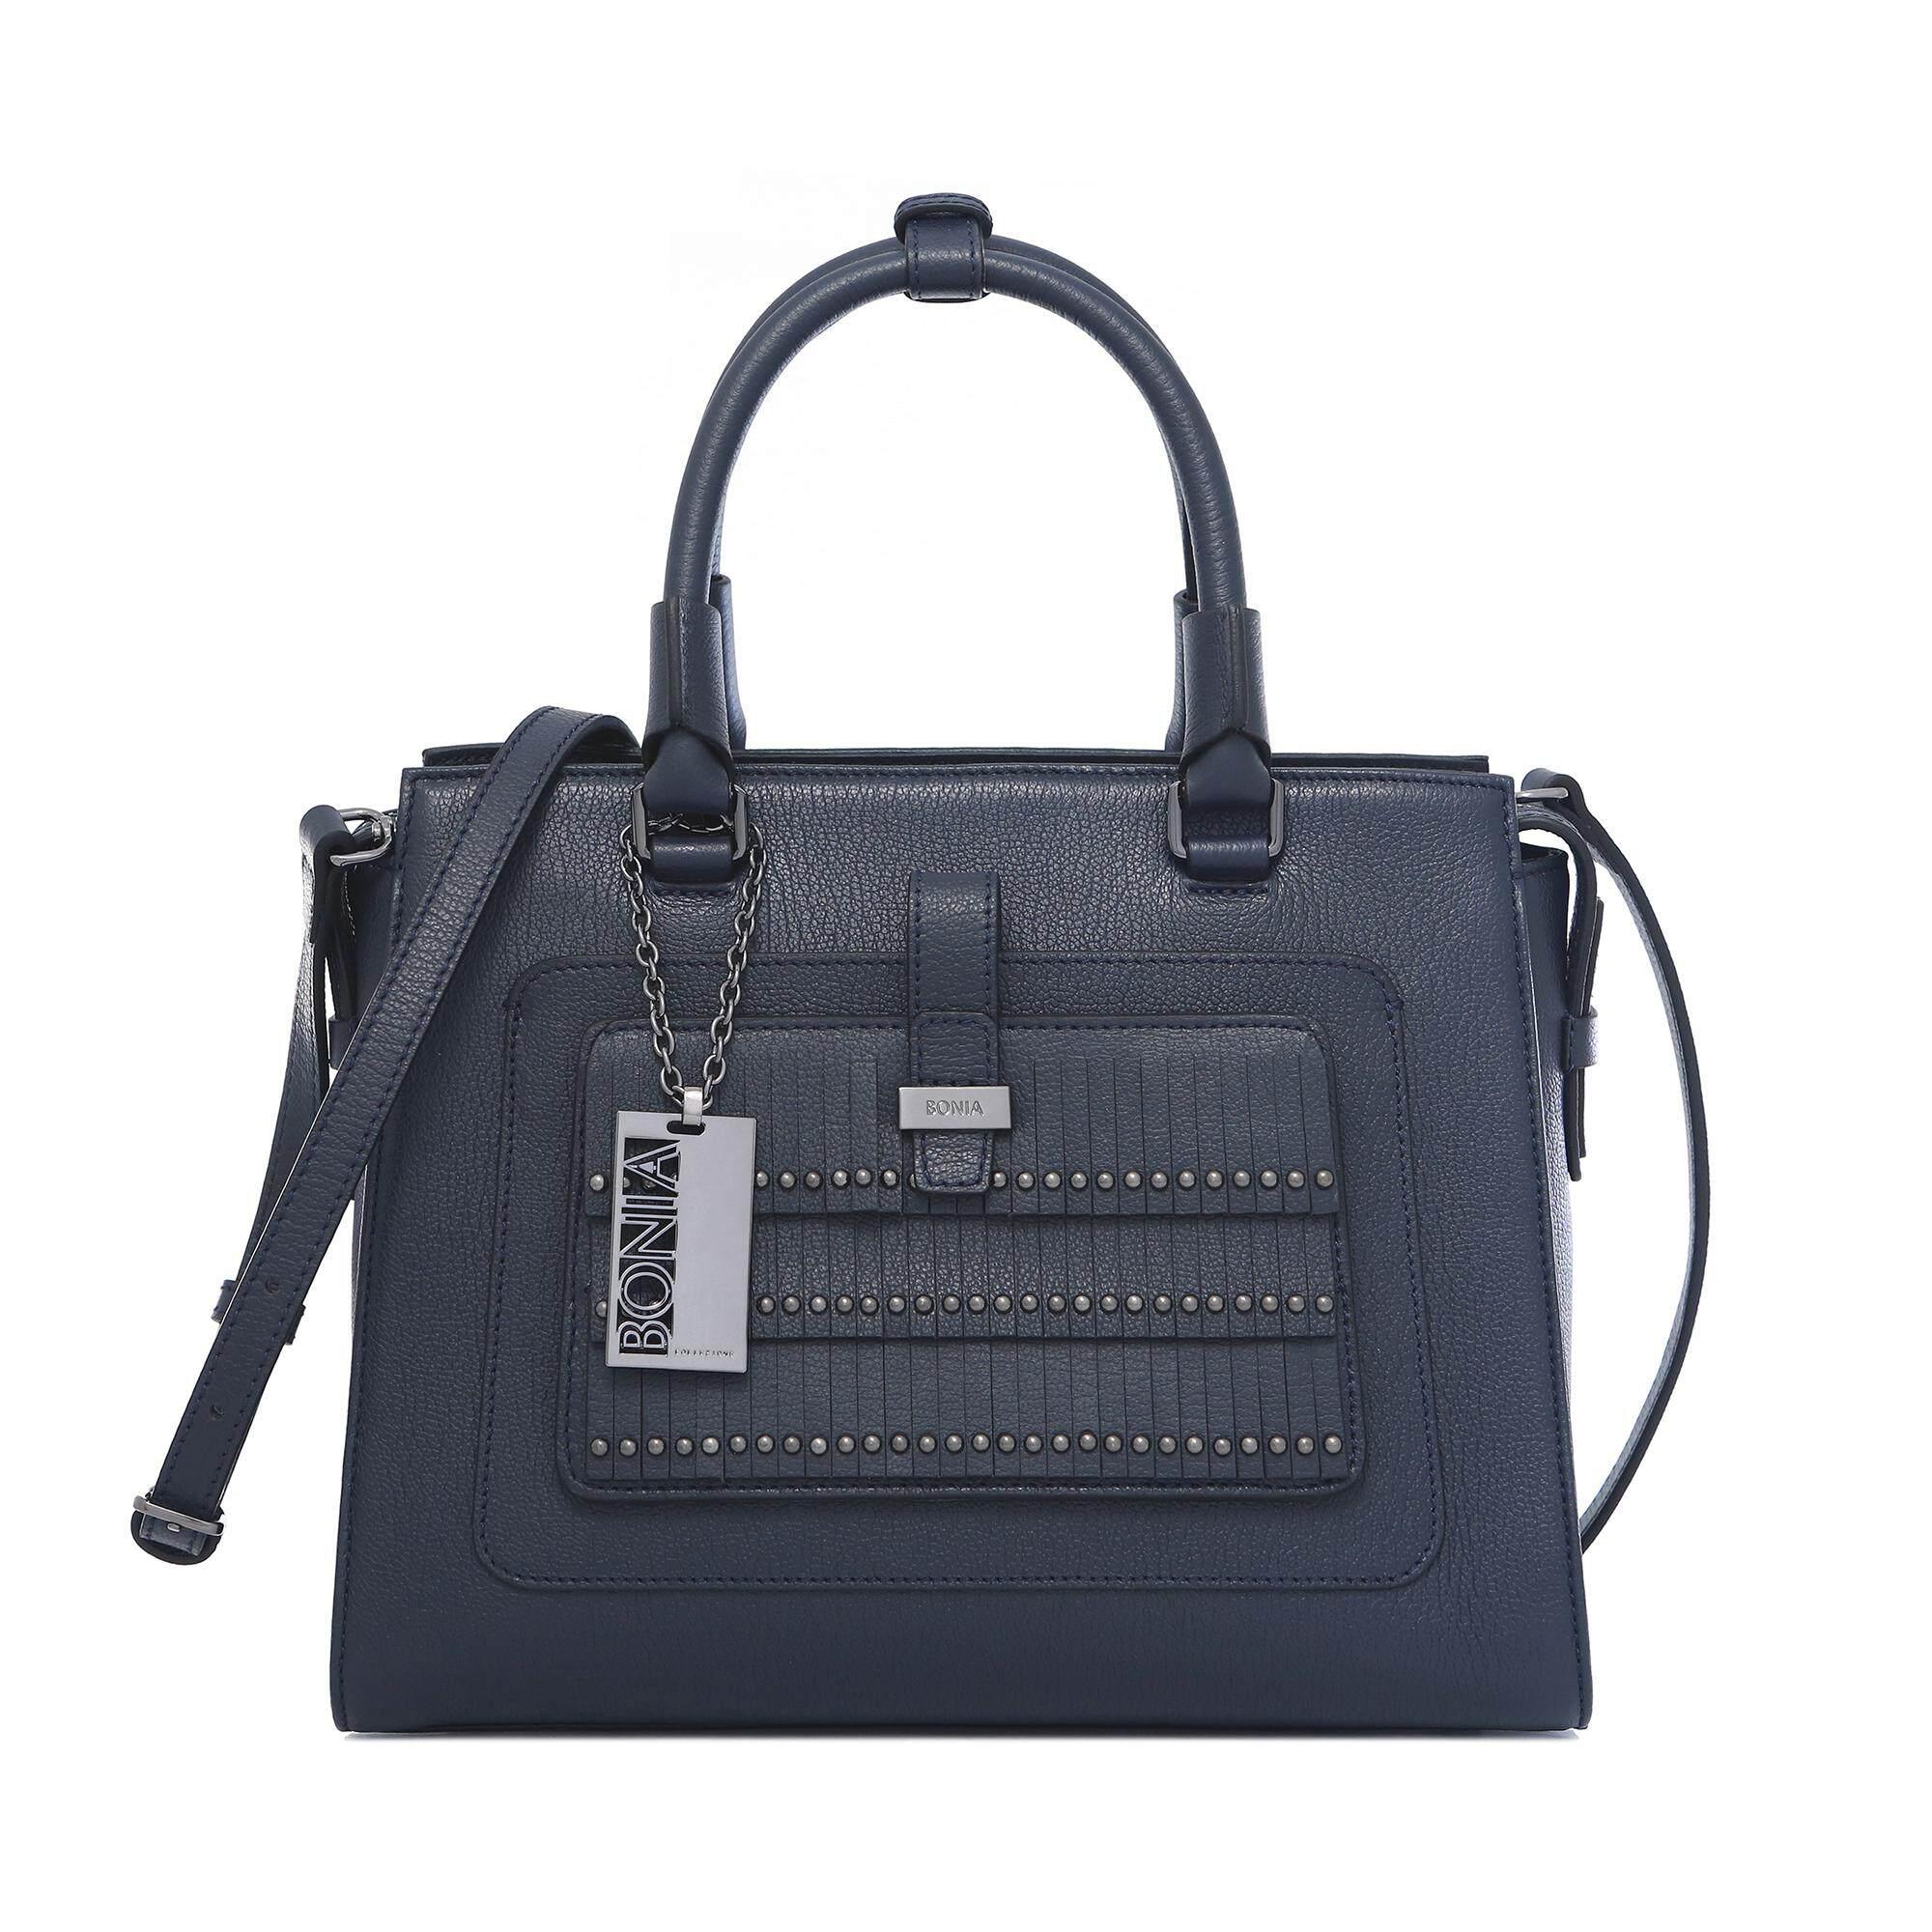 Designer Bag Online Malaysia